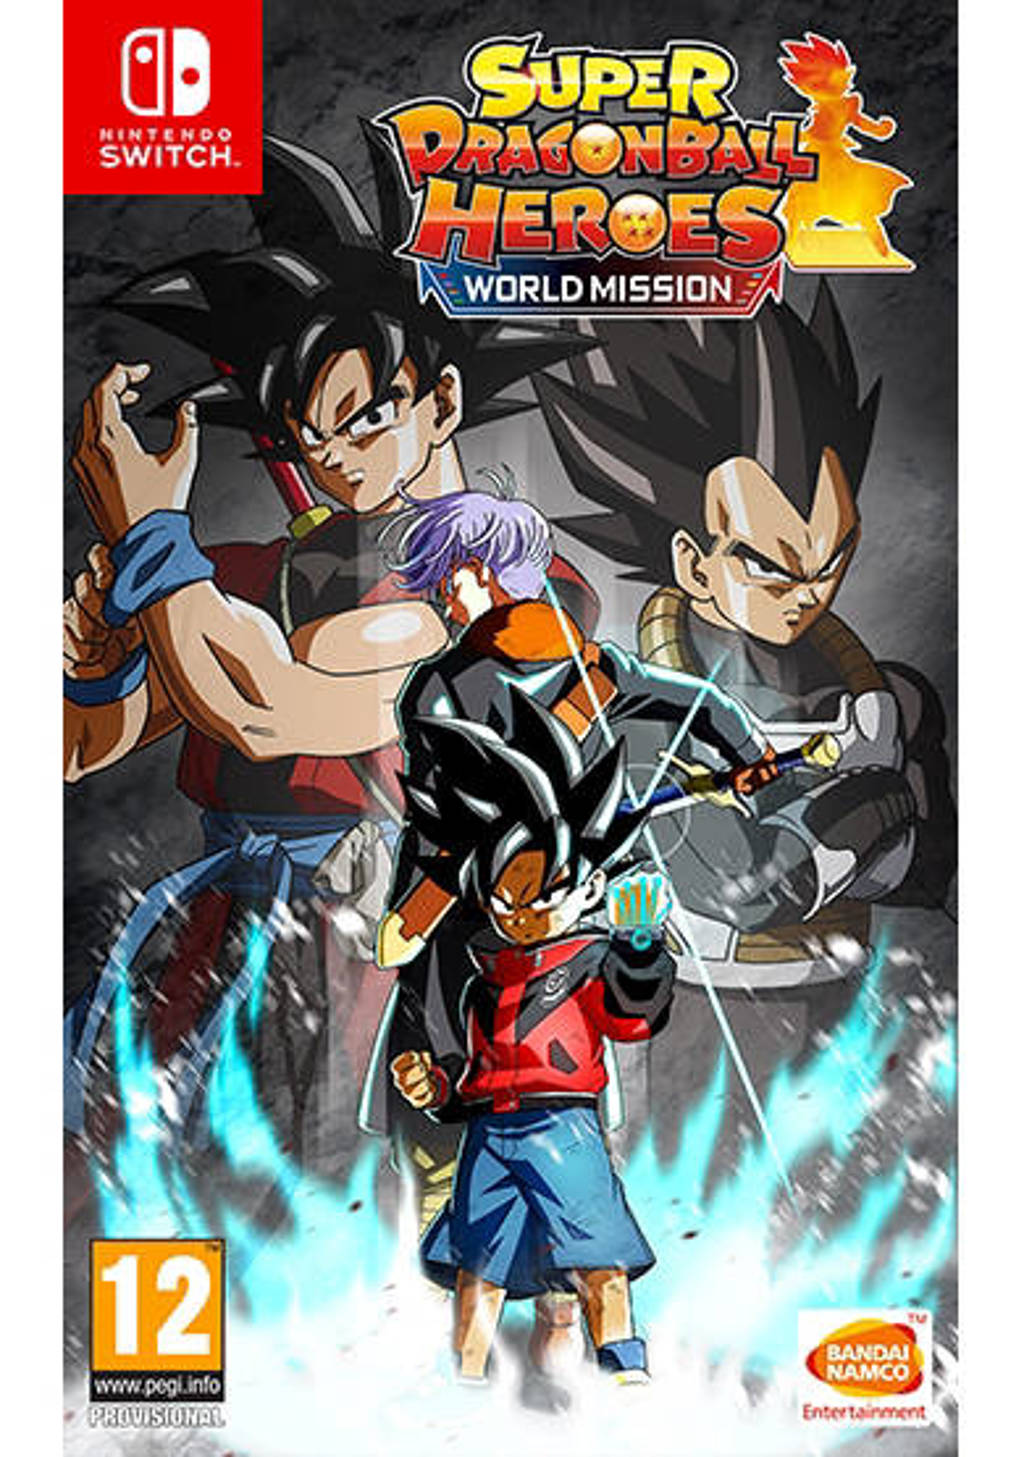 Super dragon ball heroes - World mission (Nintendo Switch)